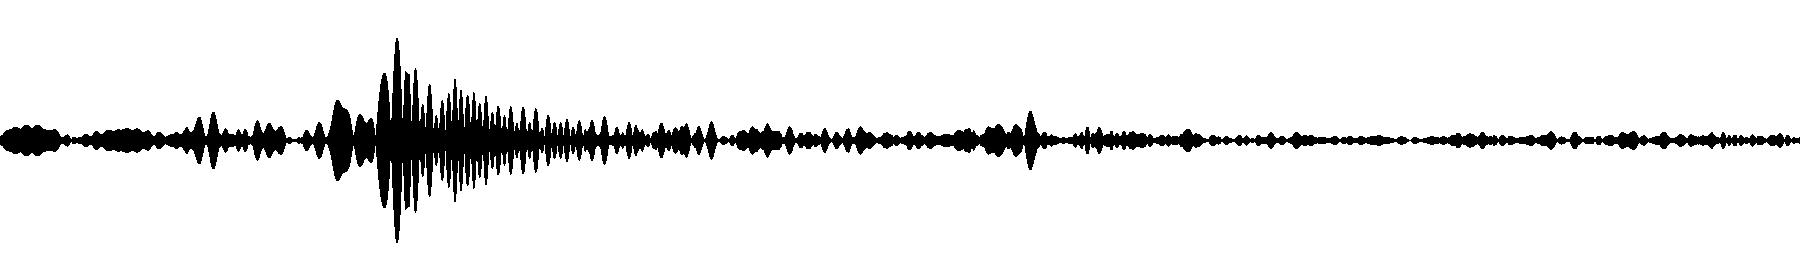 biab glitchhop blip 9